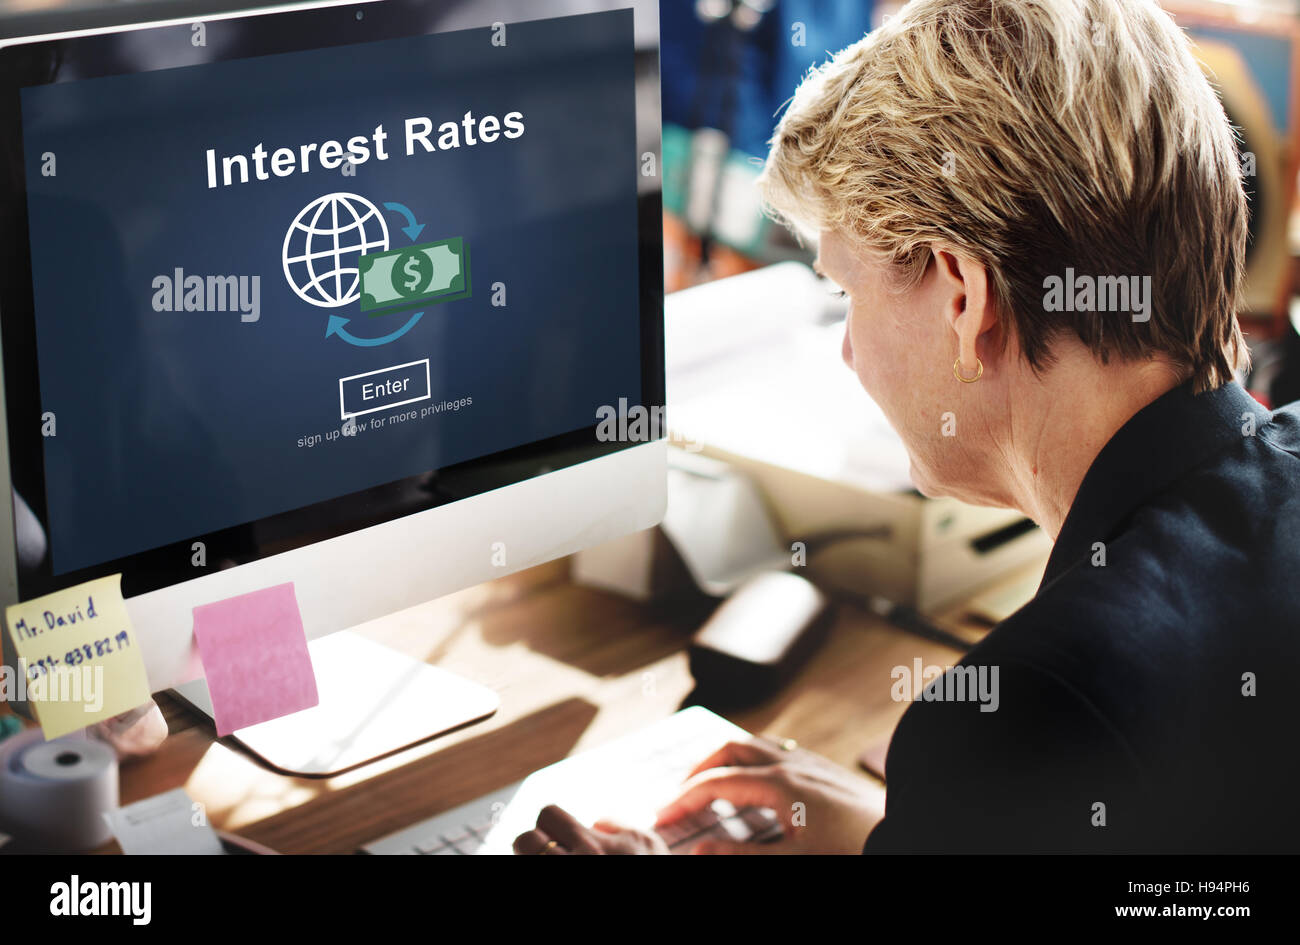 Interest Rates Economy Financial Percentage Concept - Stock Image